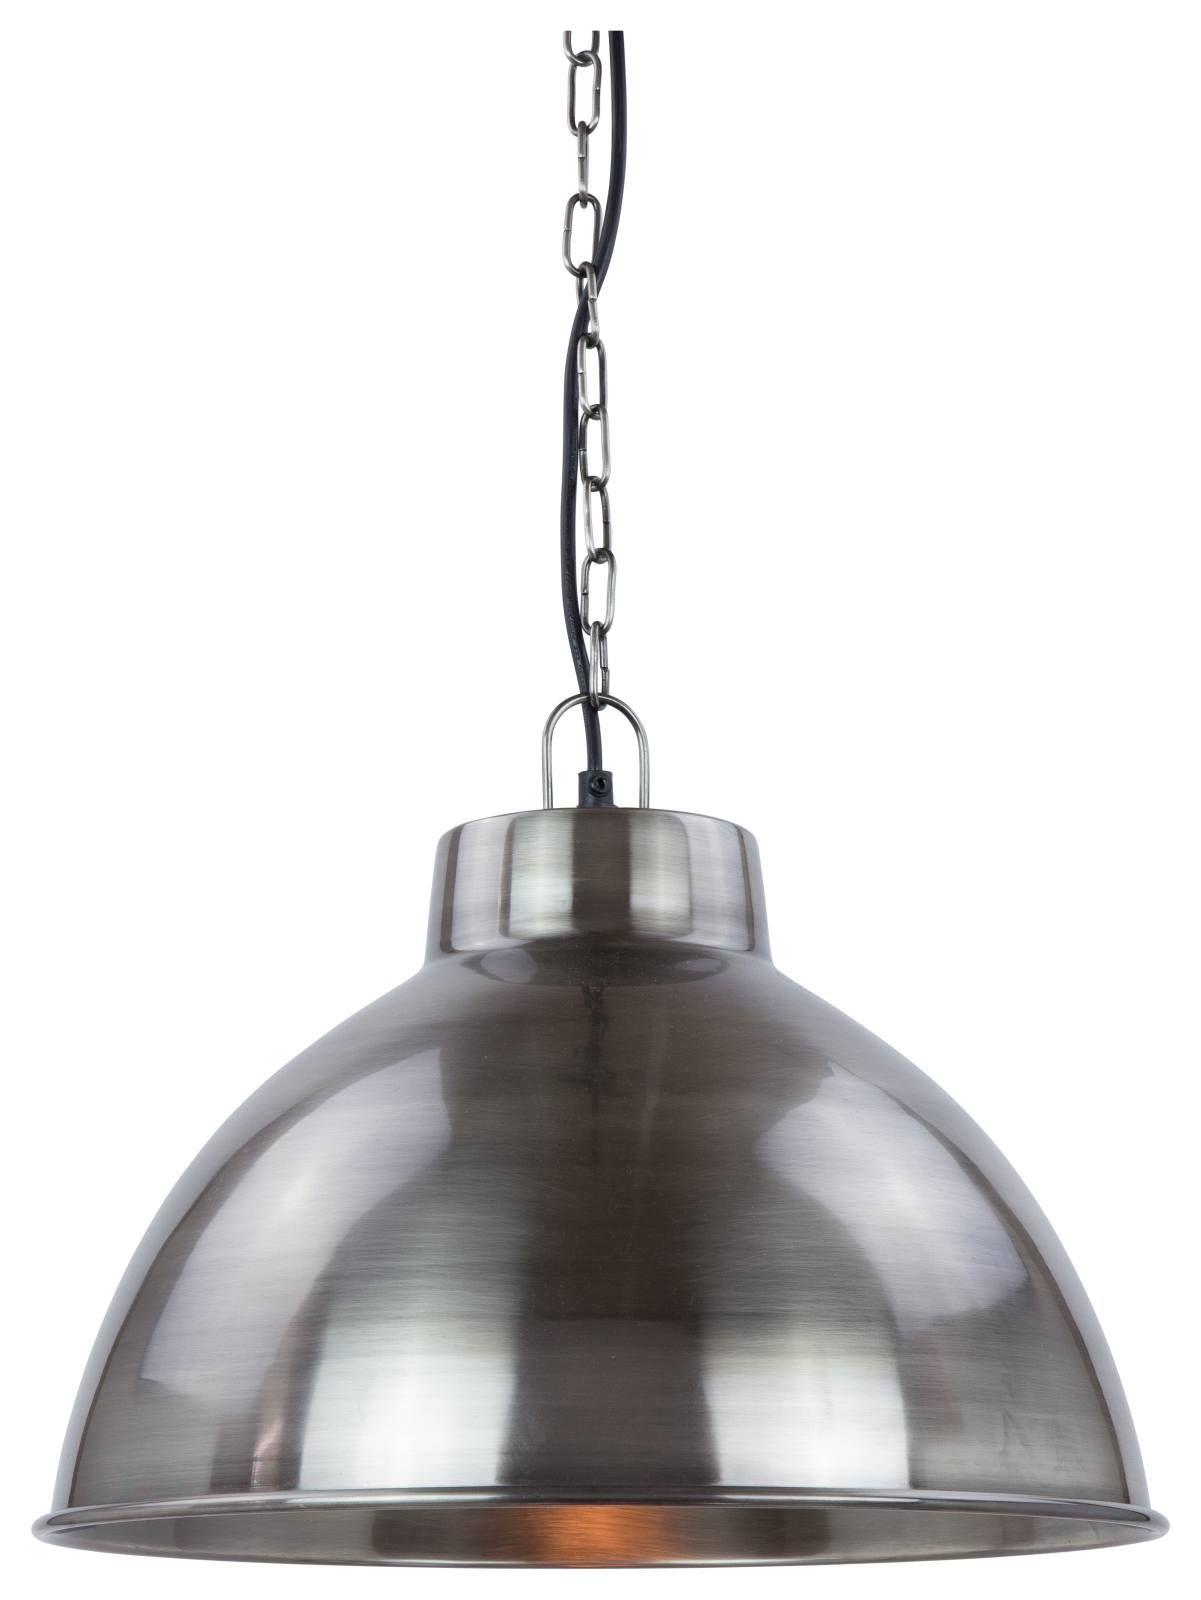 Rousses Pendant Light In 2020 Rustic Industrial Pendant Lighting Industrial Pendant Lights Iron Pendant Light